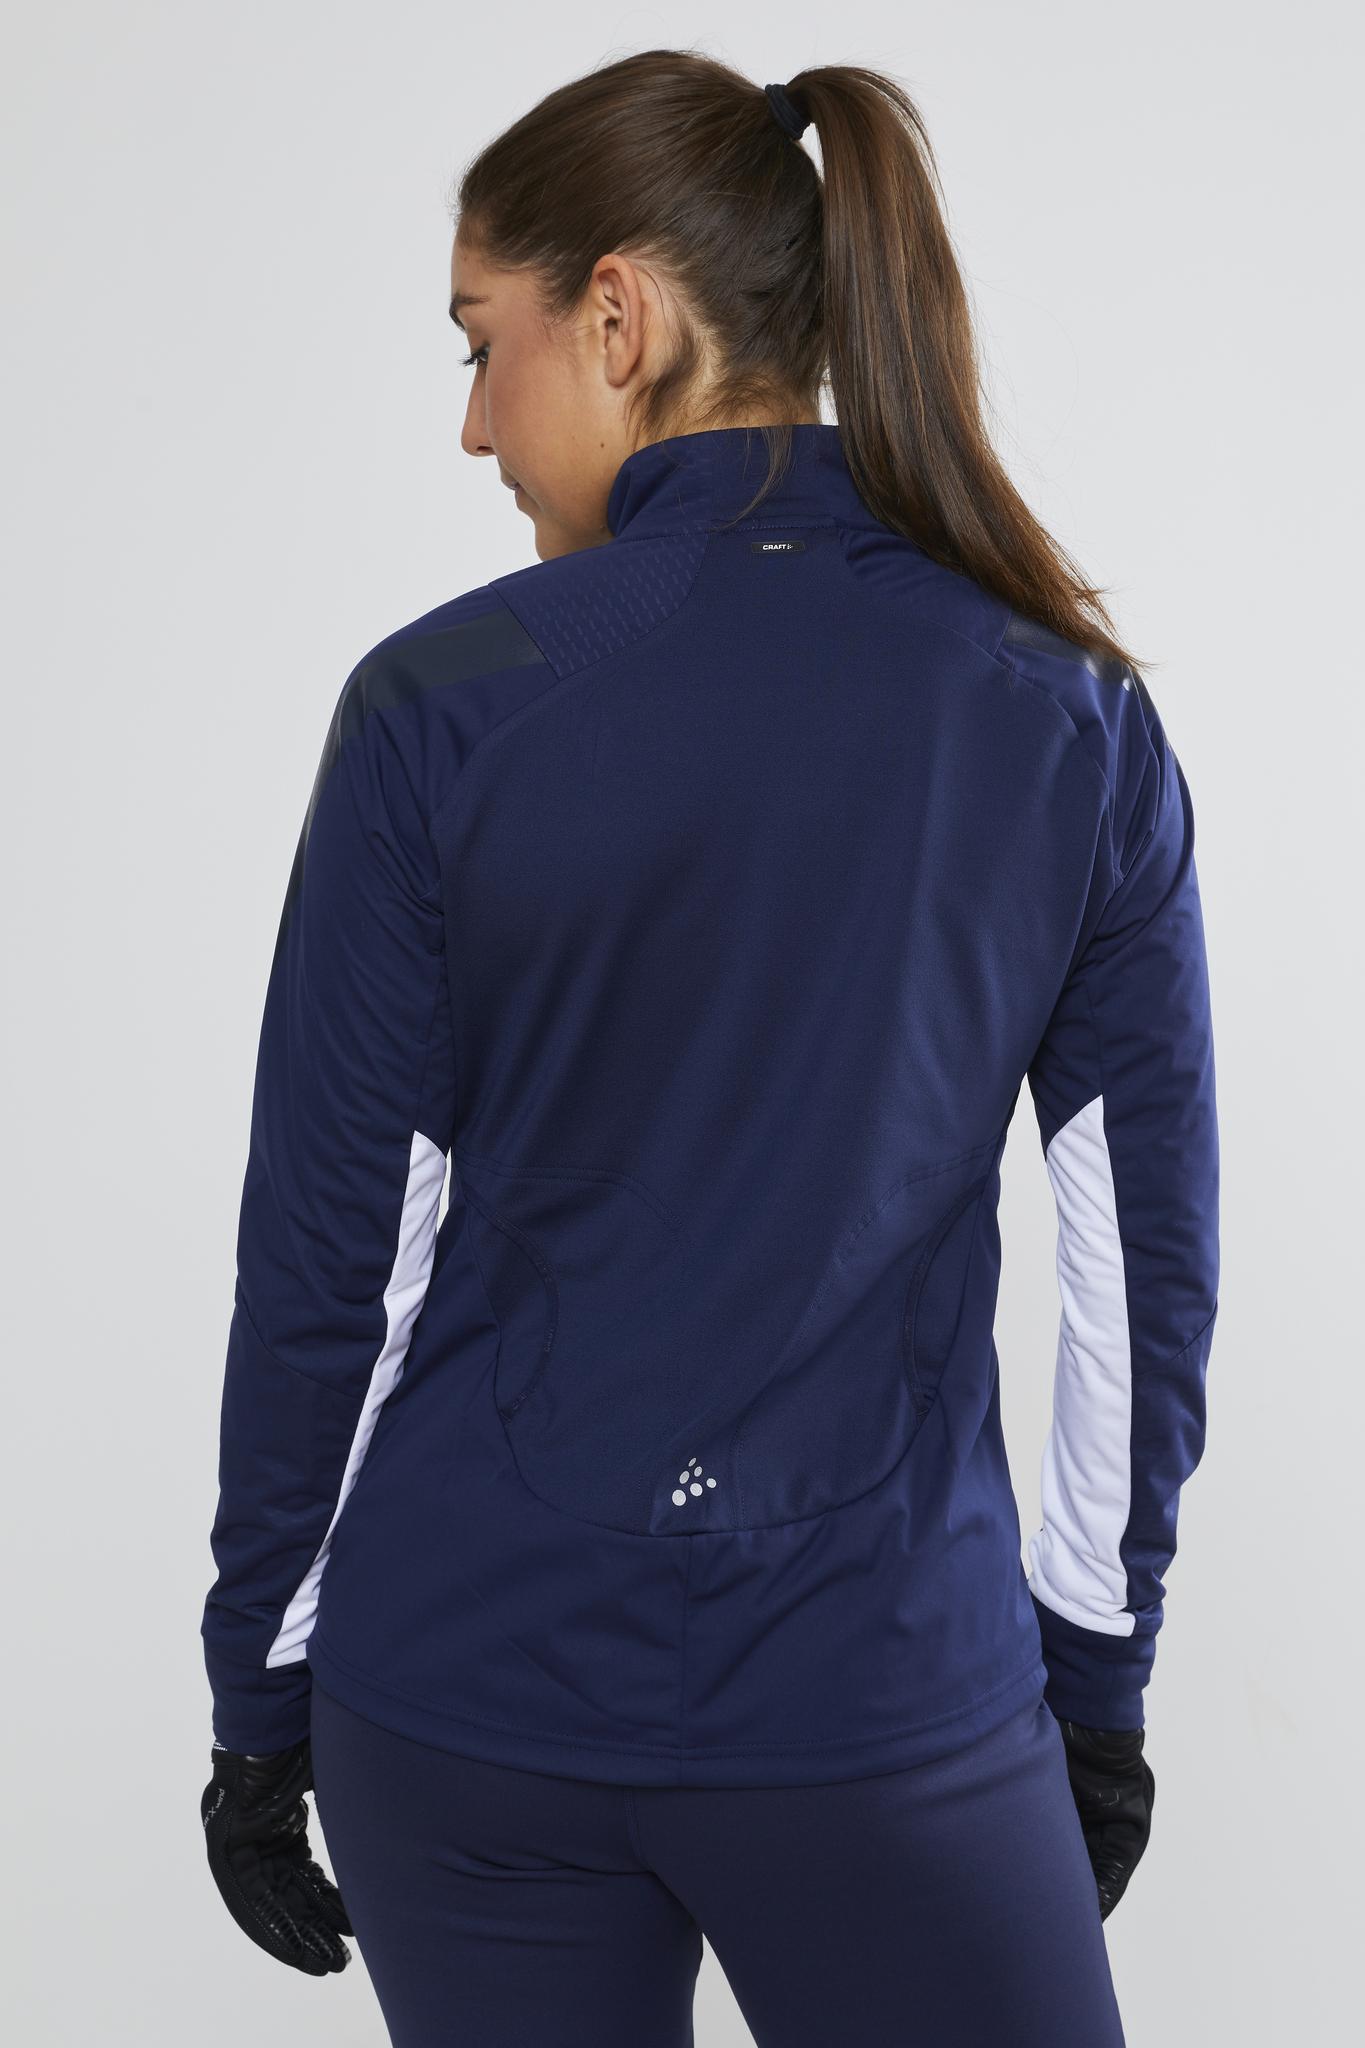 Craft Sharp XC лыжный костюм женский темно-синий - 3